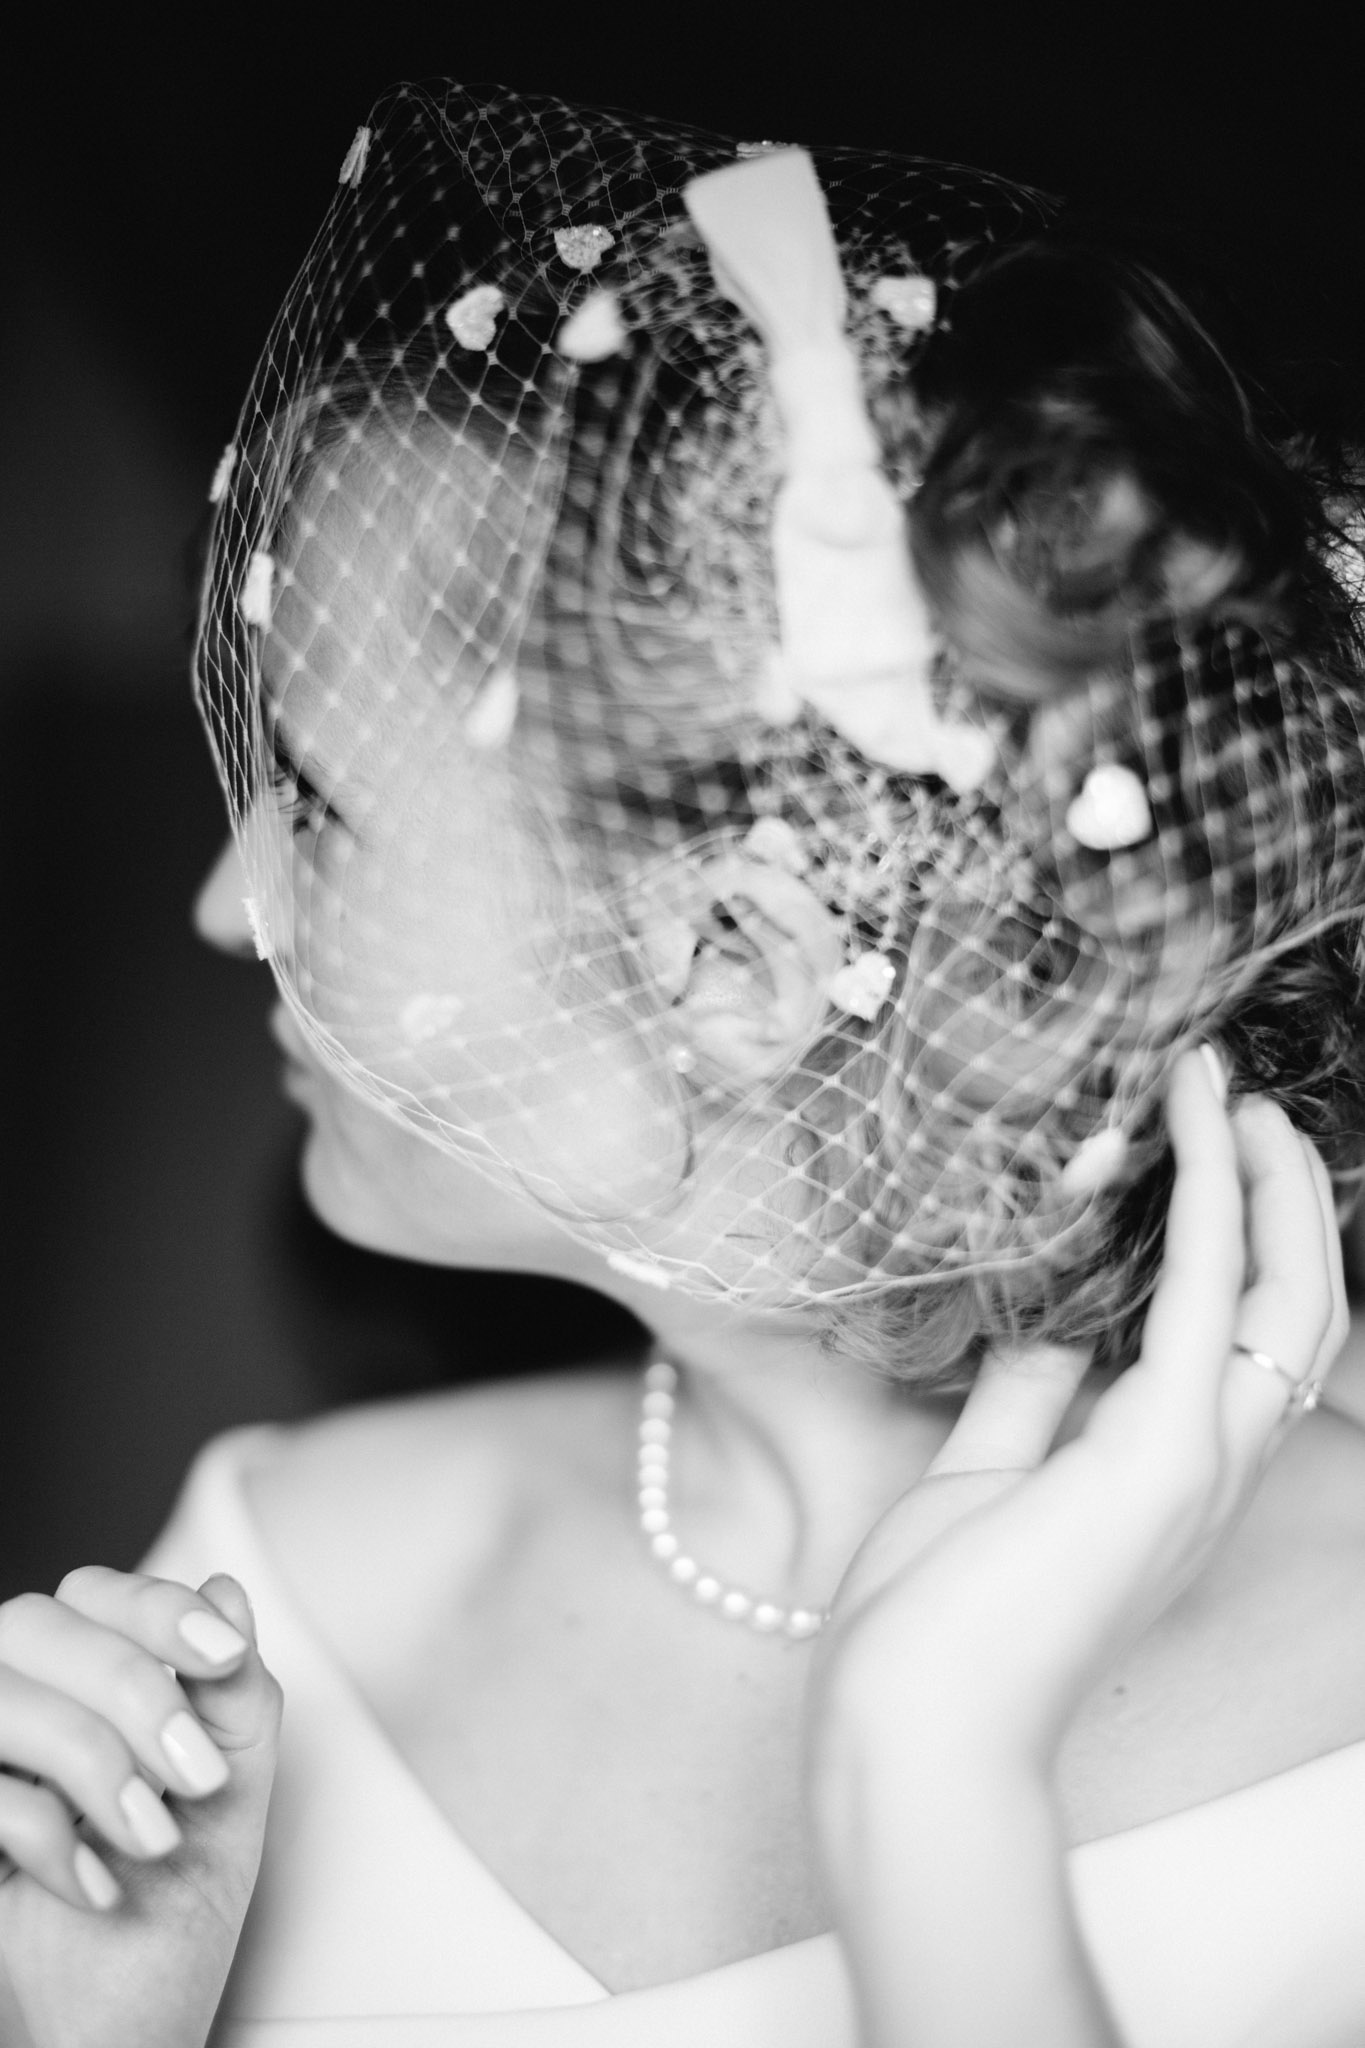 Lenl-Simmental-Buehlerhof-Pia-Anna-Christian-Wedding-Photography-EK-21.jpg